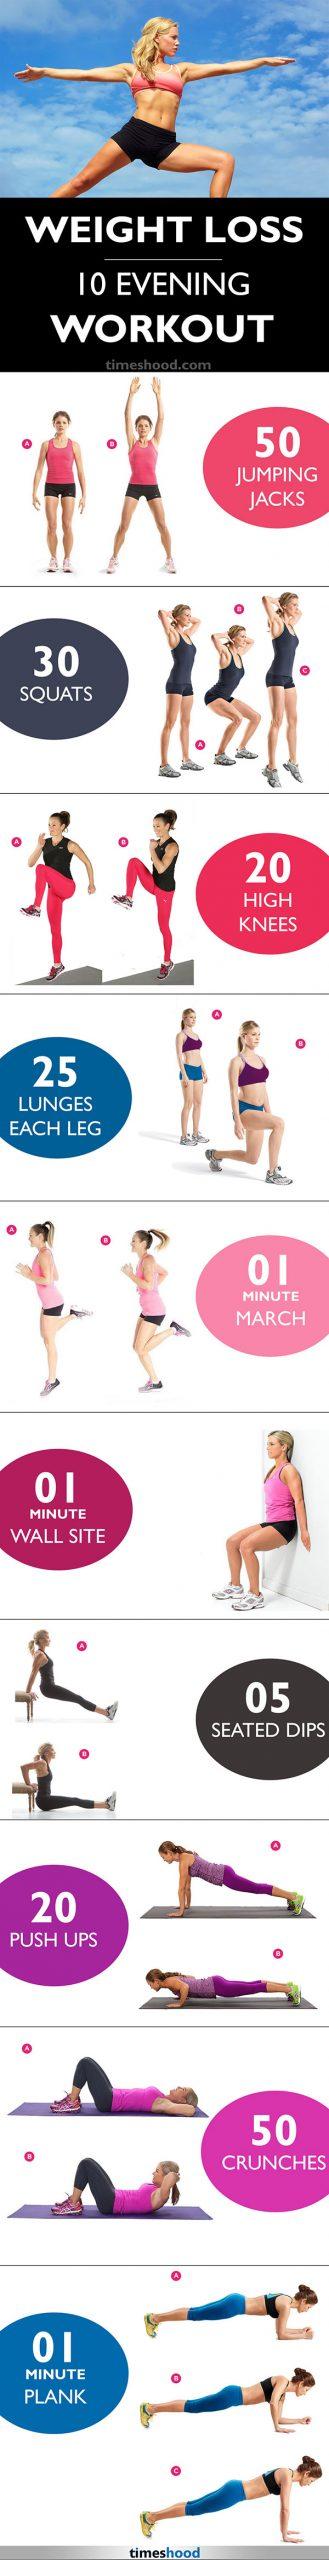 Evening Workouts for Weightloss